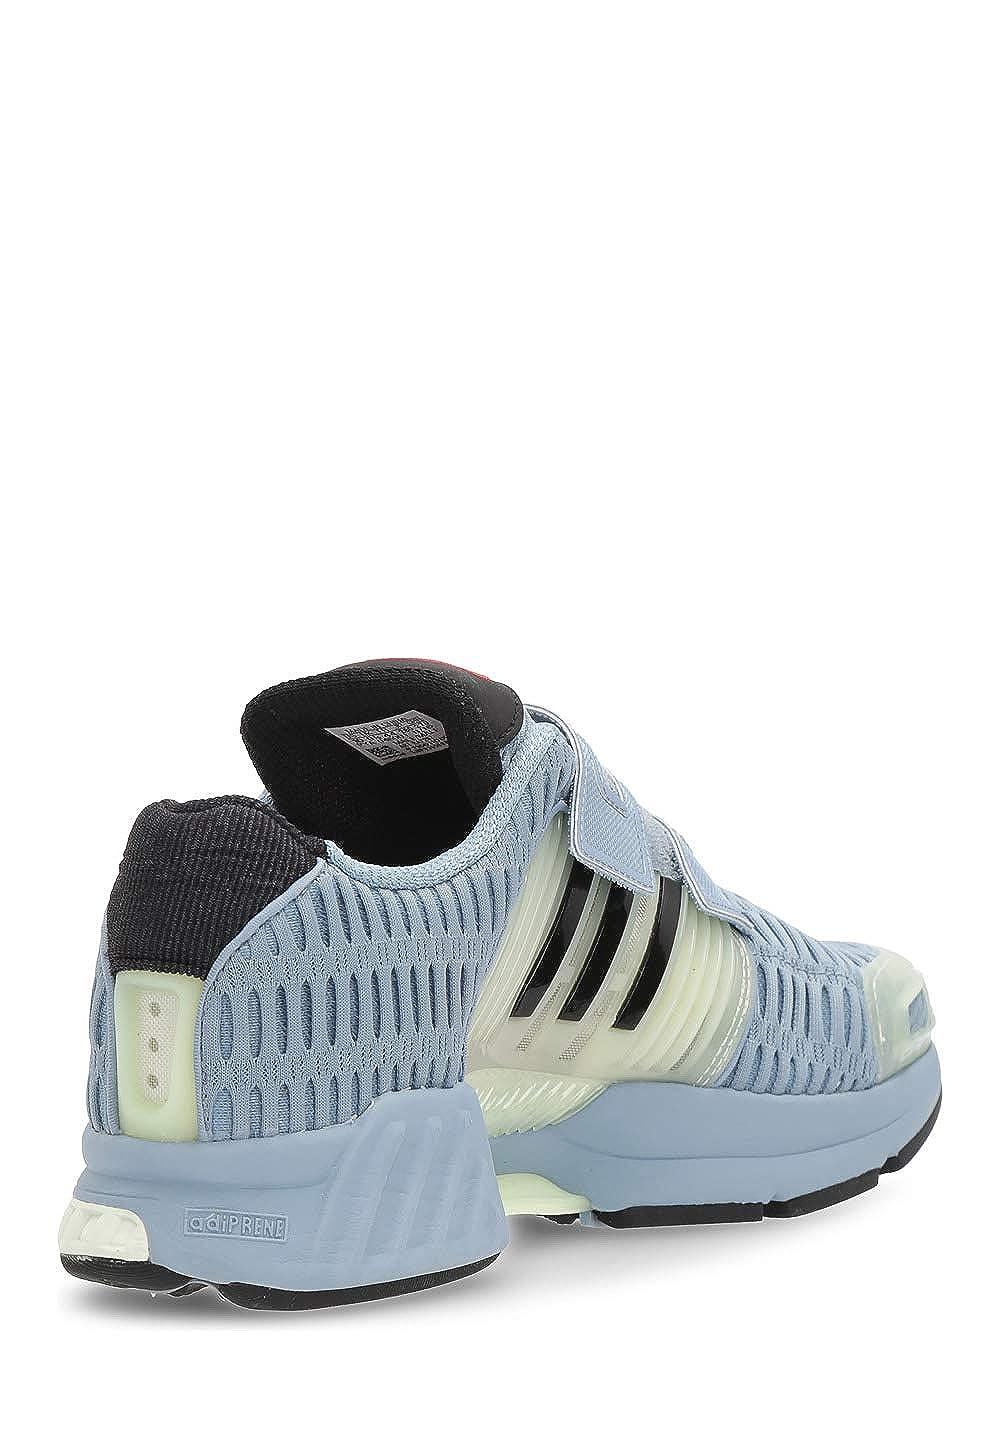 Adidas Clima Cool Cool Cool 1 CMF Light Blau 825851